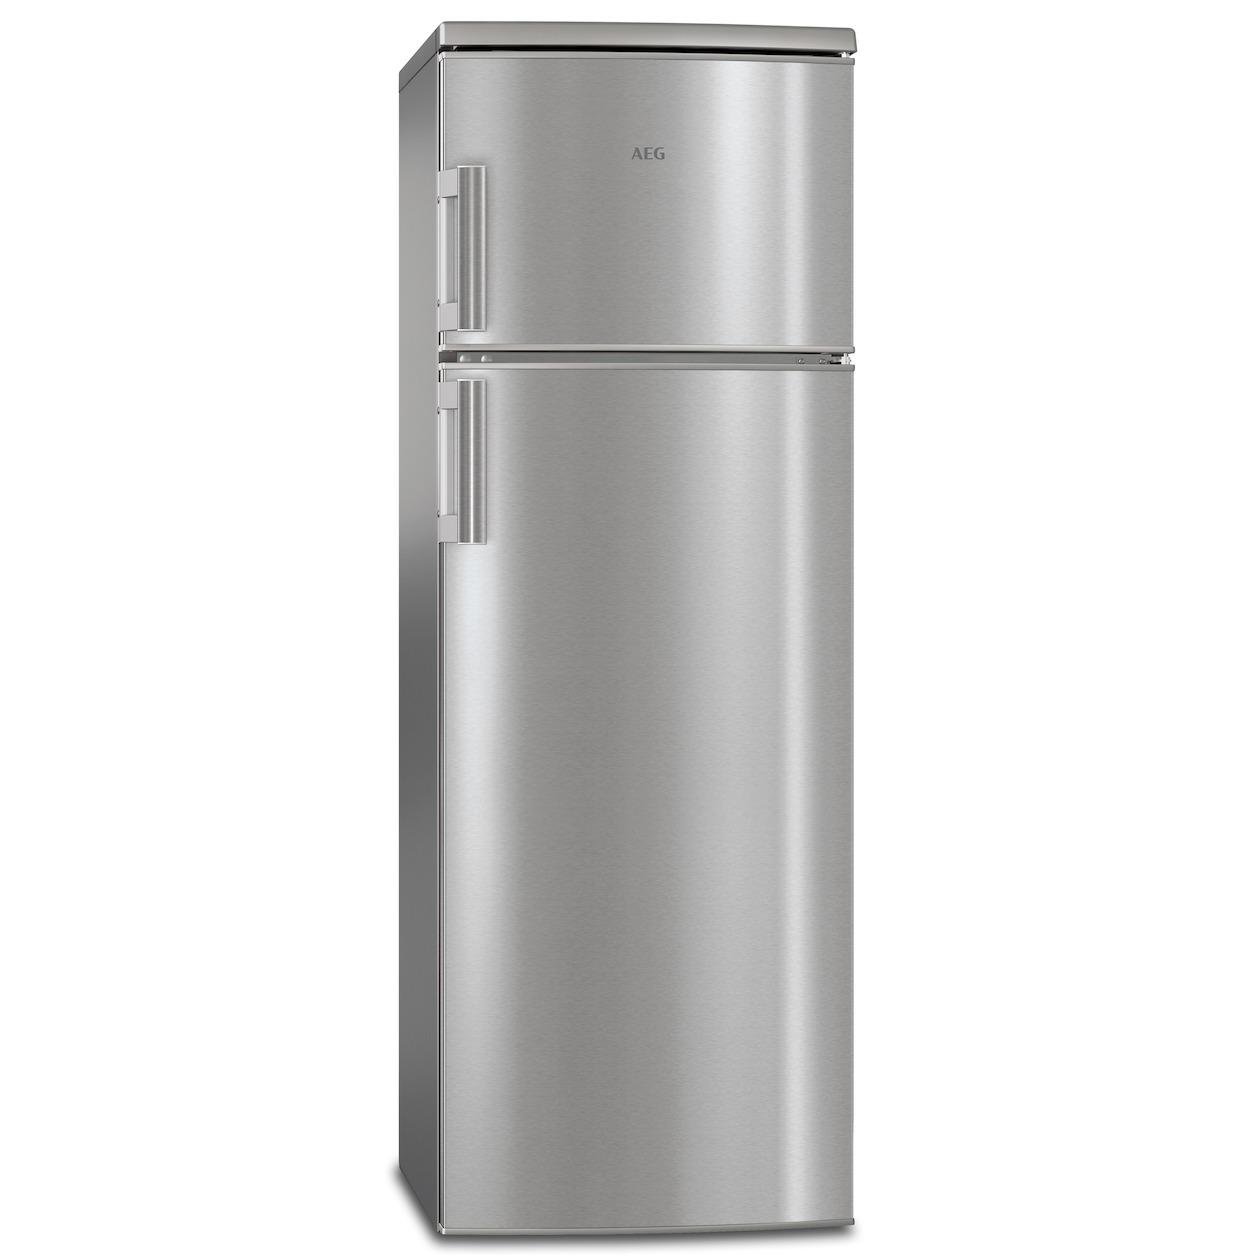 AEG koelkast met vriesvak RDB72321AX - Prijsvergelijk